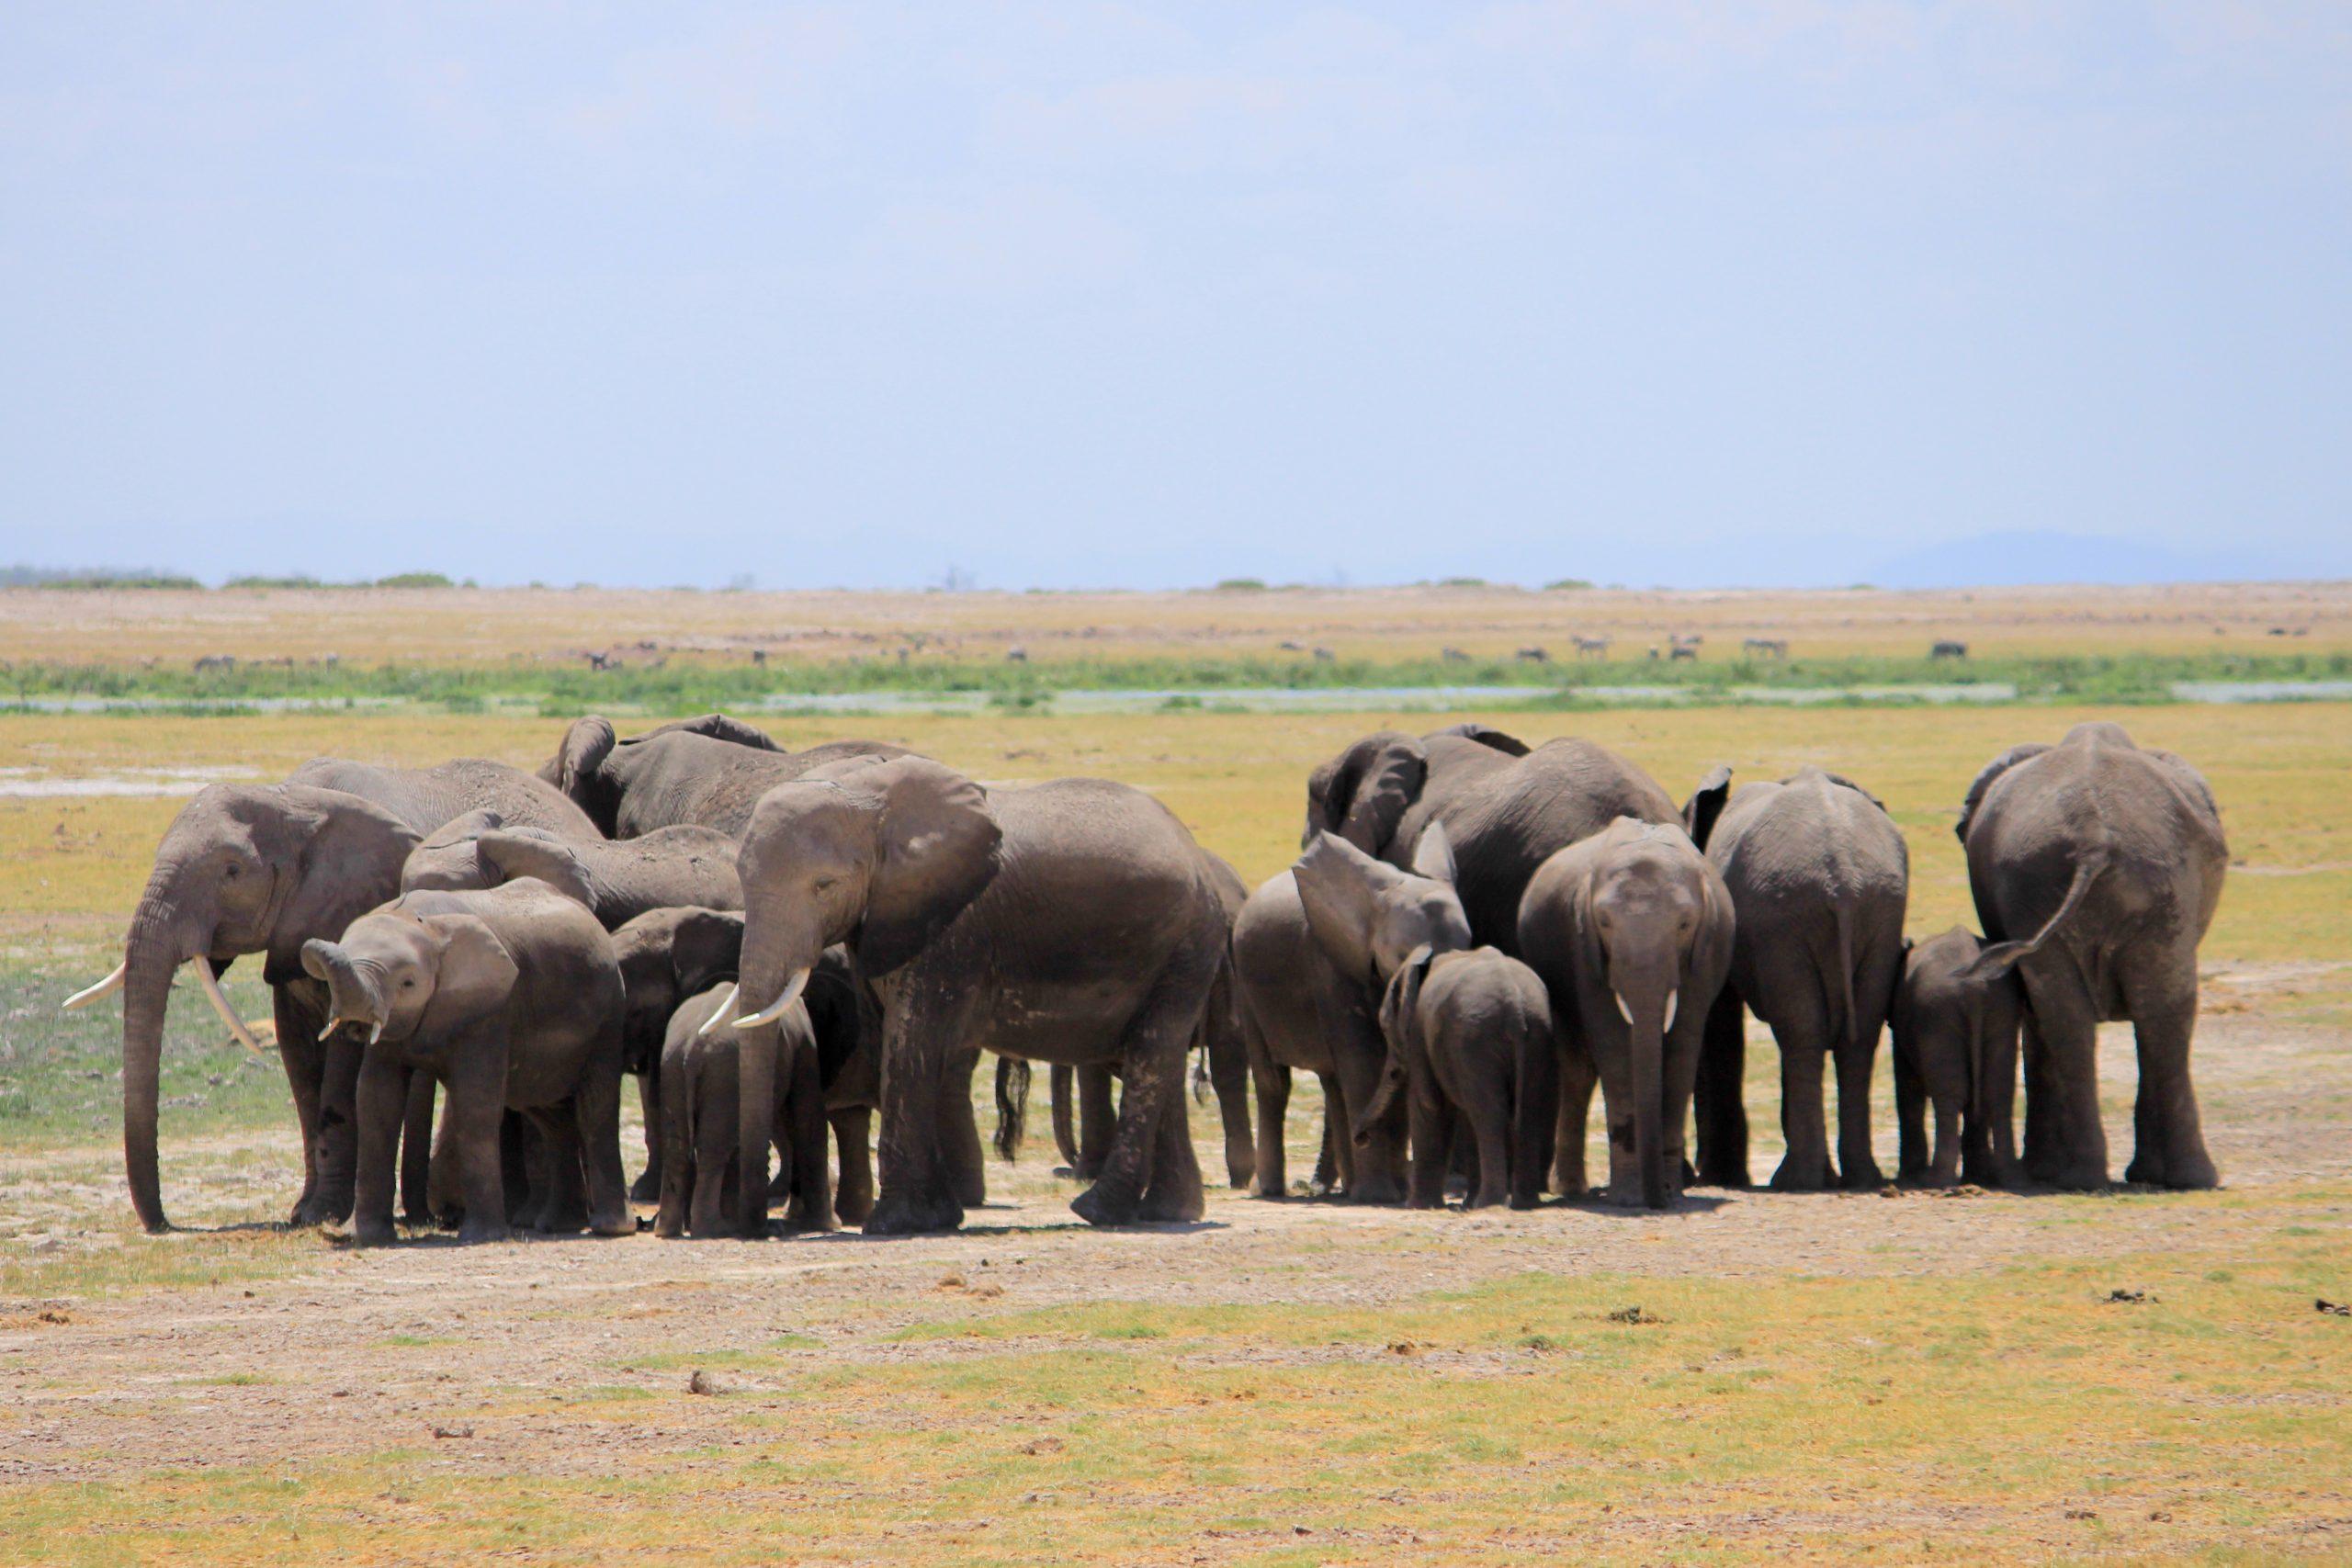 48 Hours In Amboseli